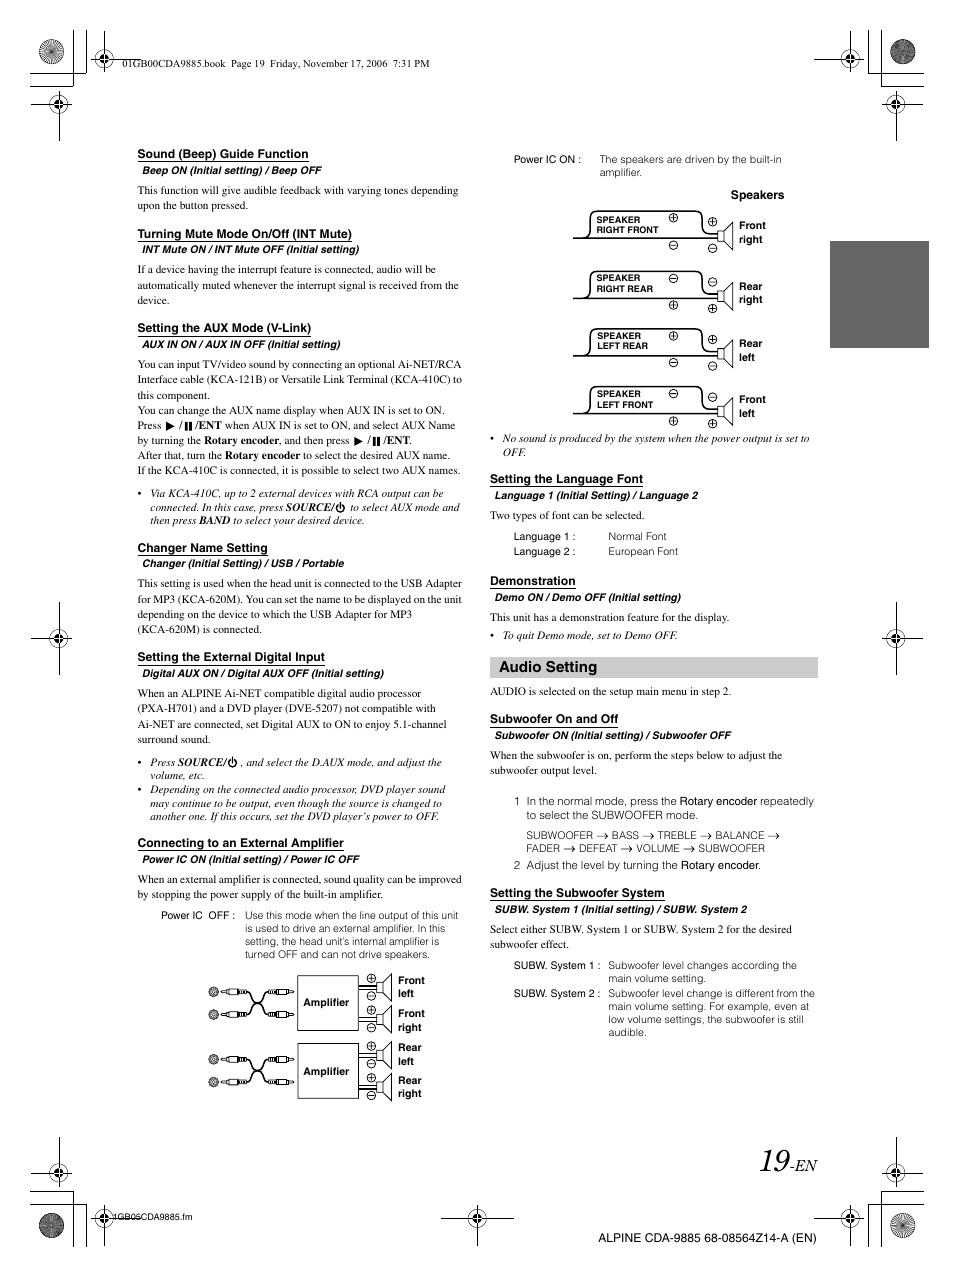 audio setting alpine cda 9885 user manual page 21 41 rh manualsdir com alpine cda 9883 manual download alpine cda-9885r manual